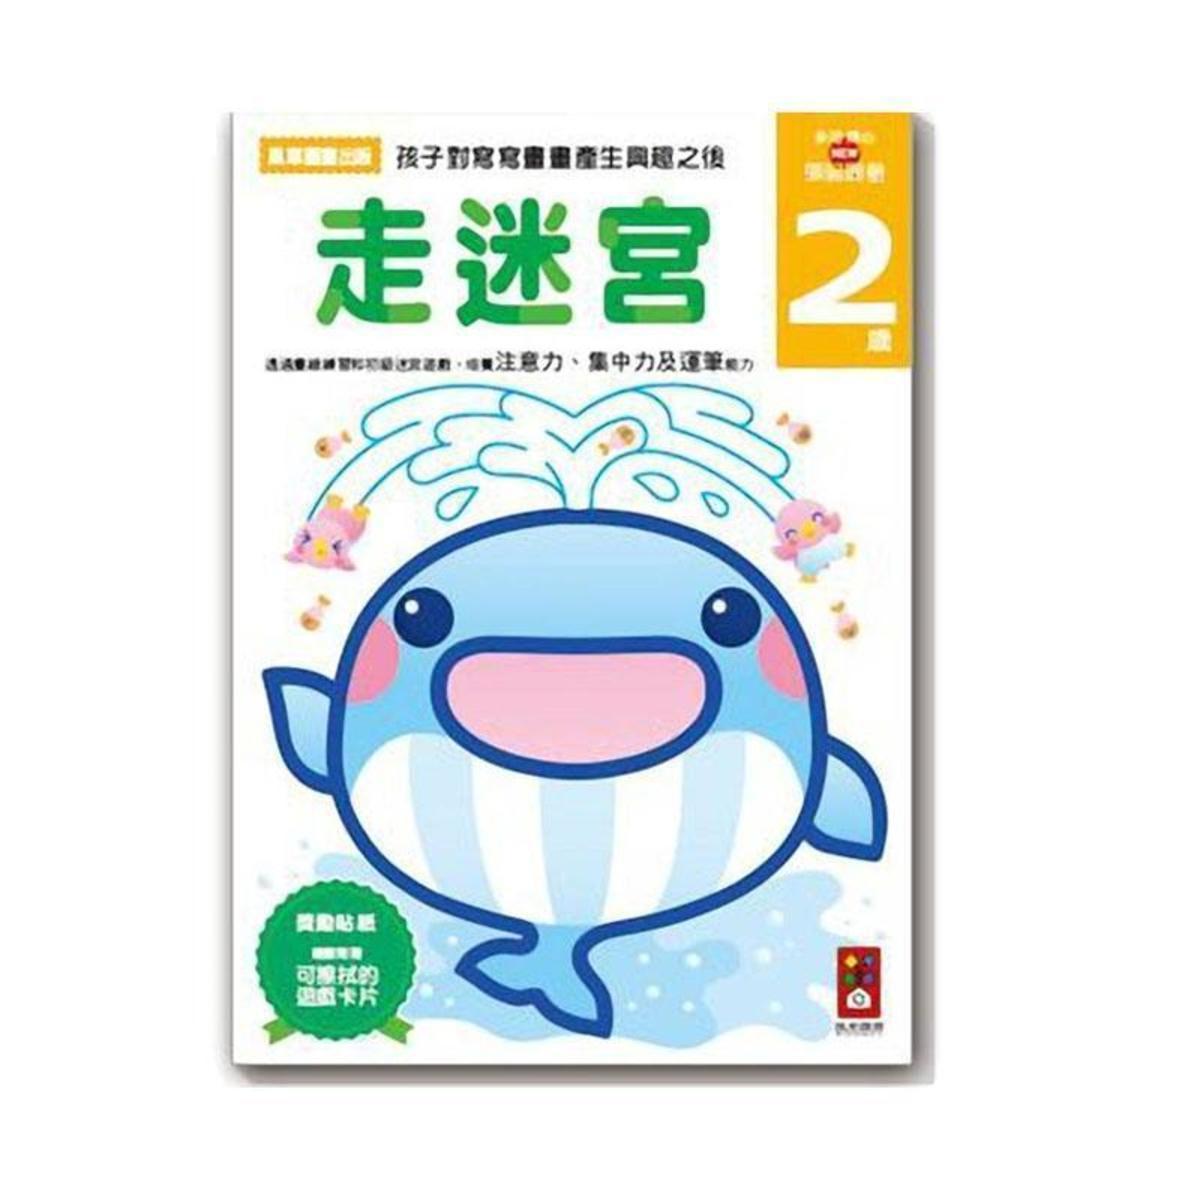 Publishing Going Maze 2 Years - Multi-Huhui's NEW Mind Development Taiwan Import